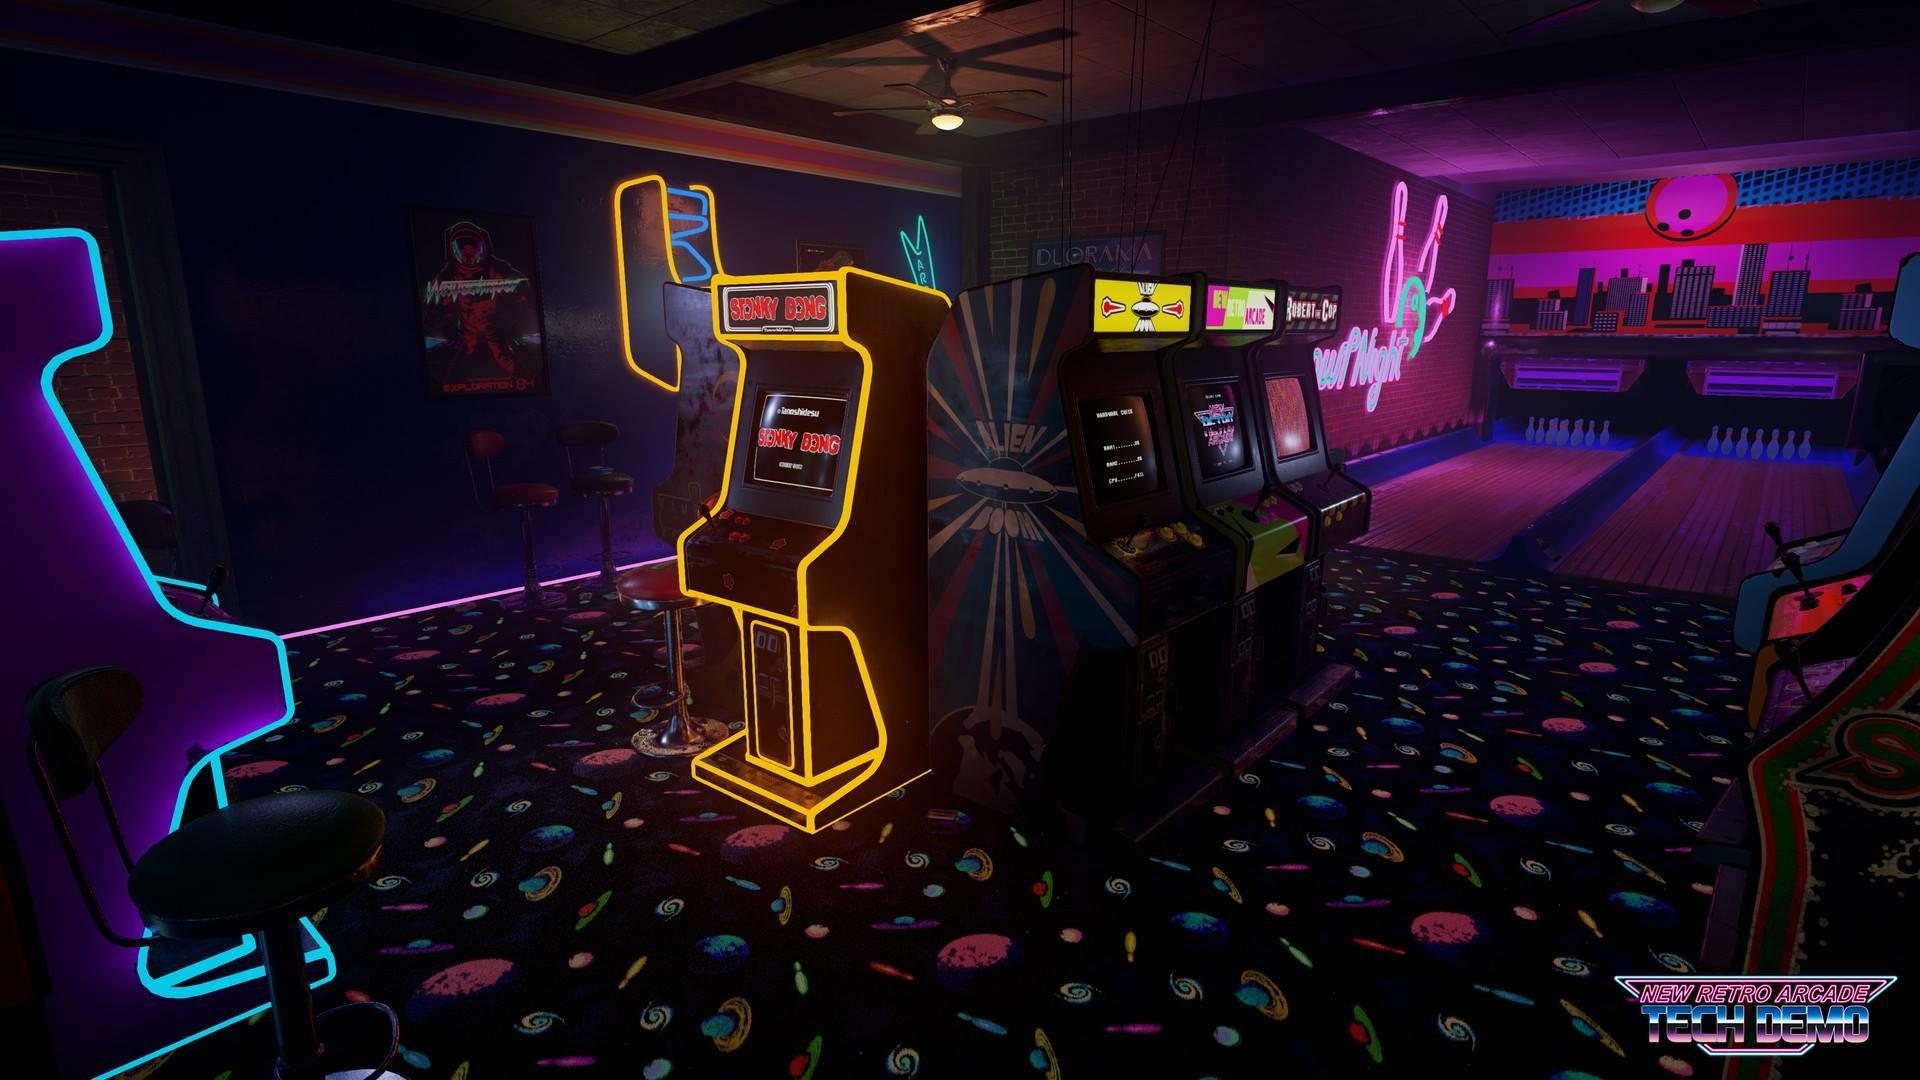 'New Retro Arcade' …